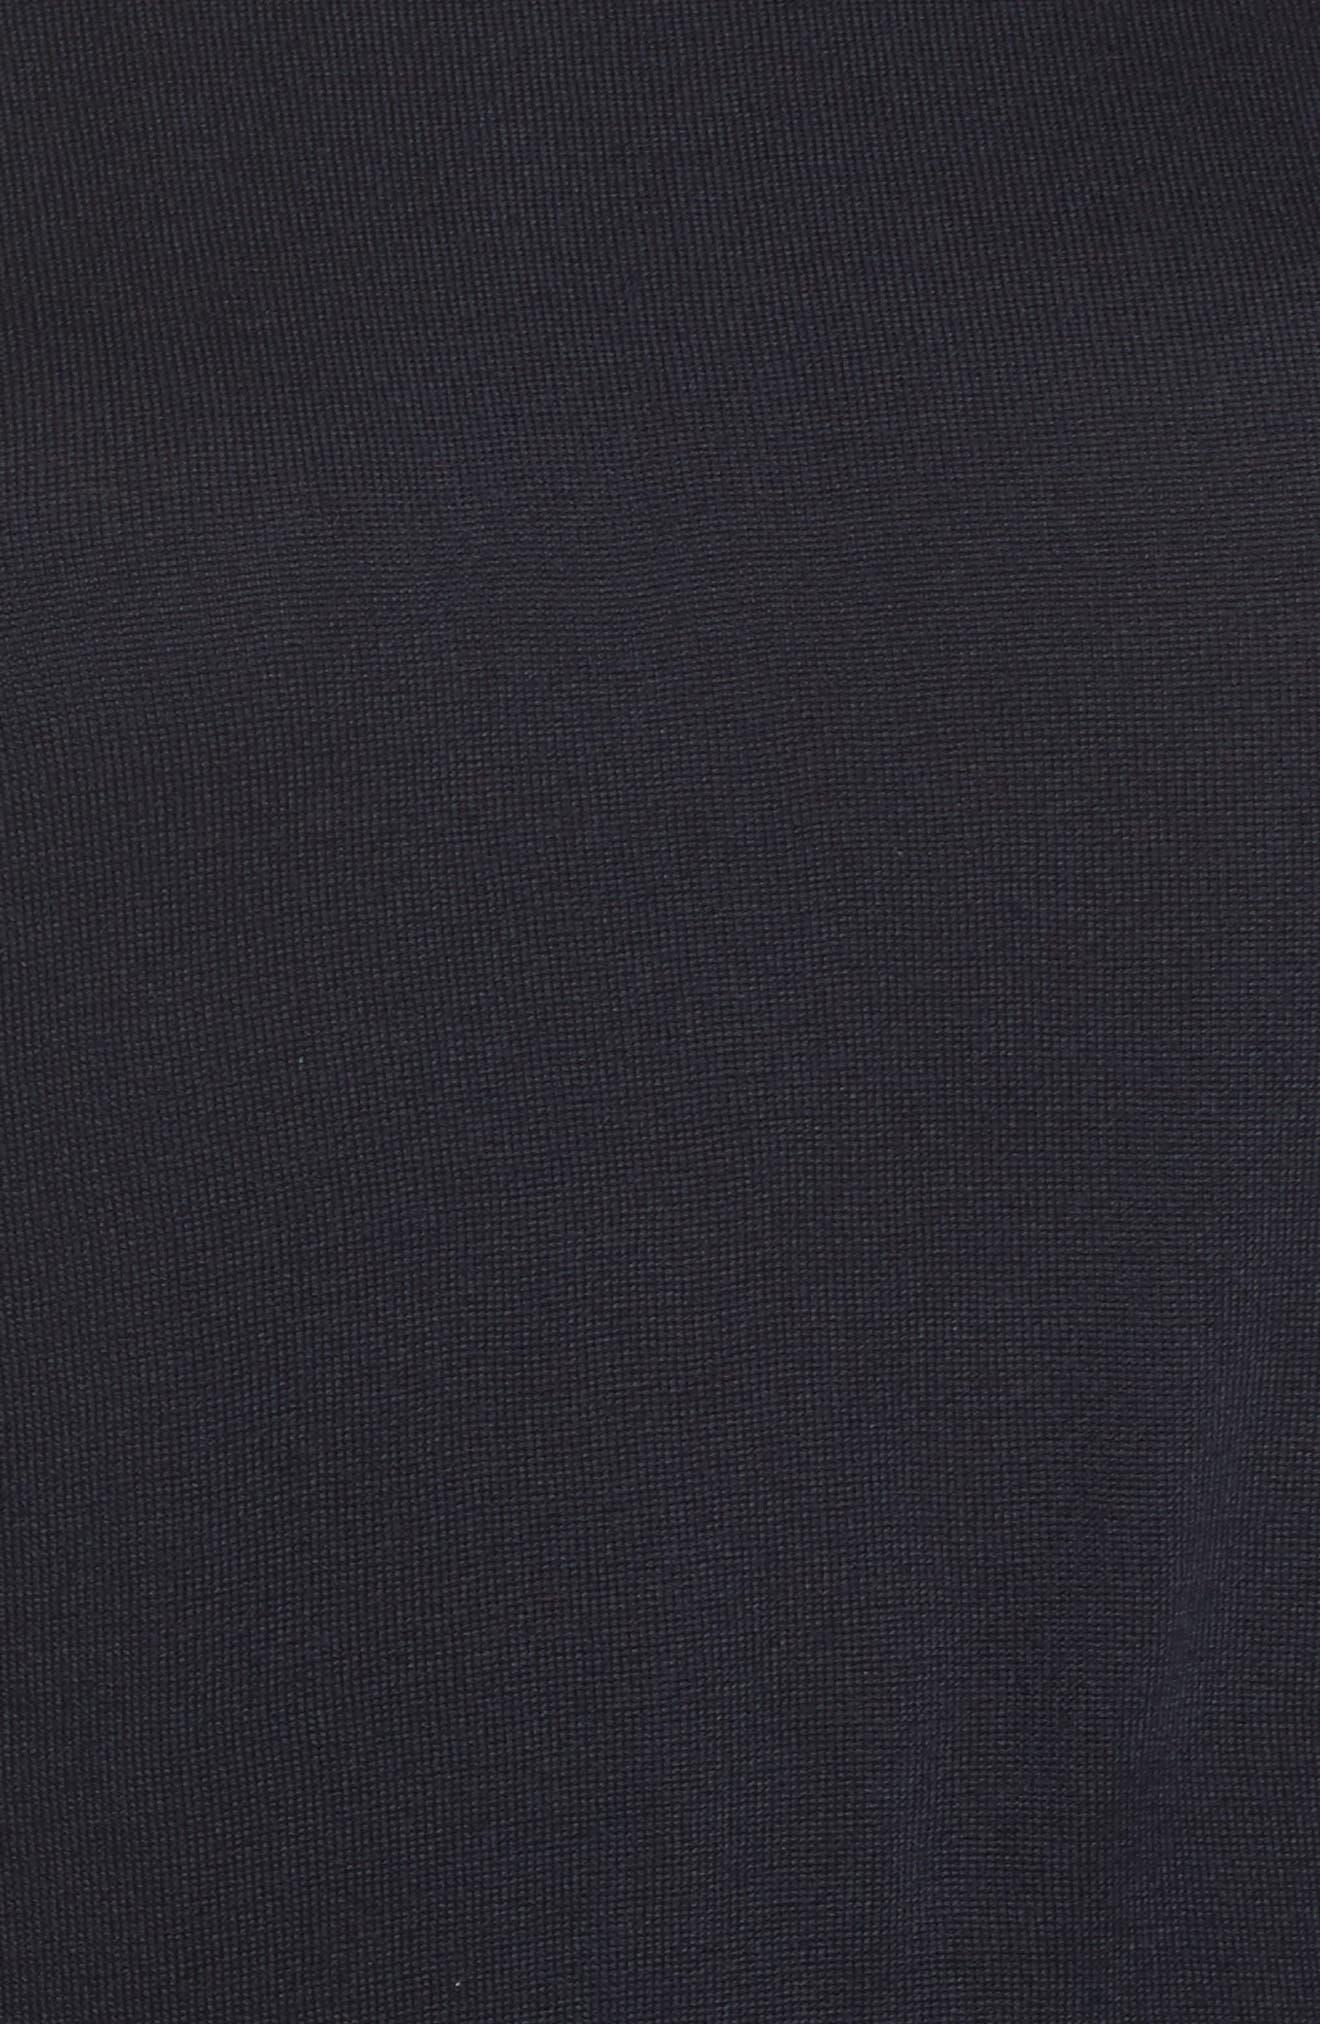 Alternate Image 5  - Persona by Marina Rinaldi Adamo MIxed Media Sweater (Plus Size)